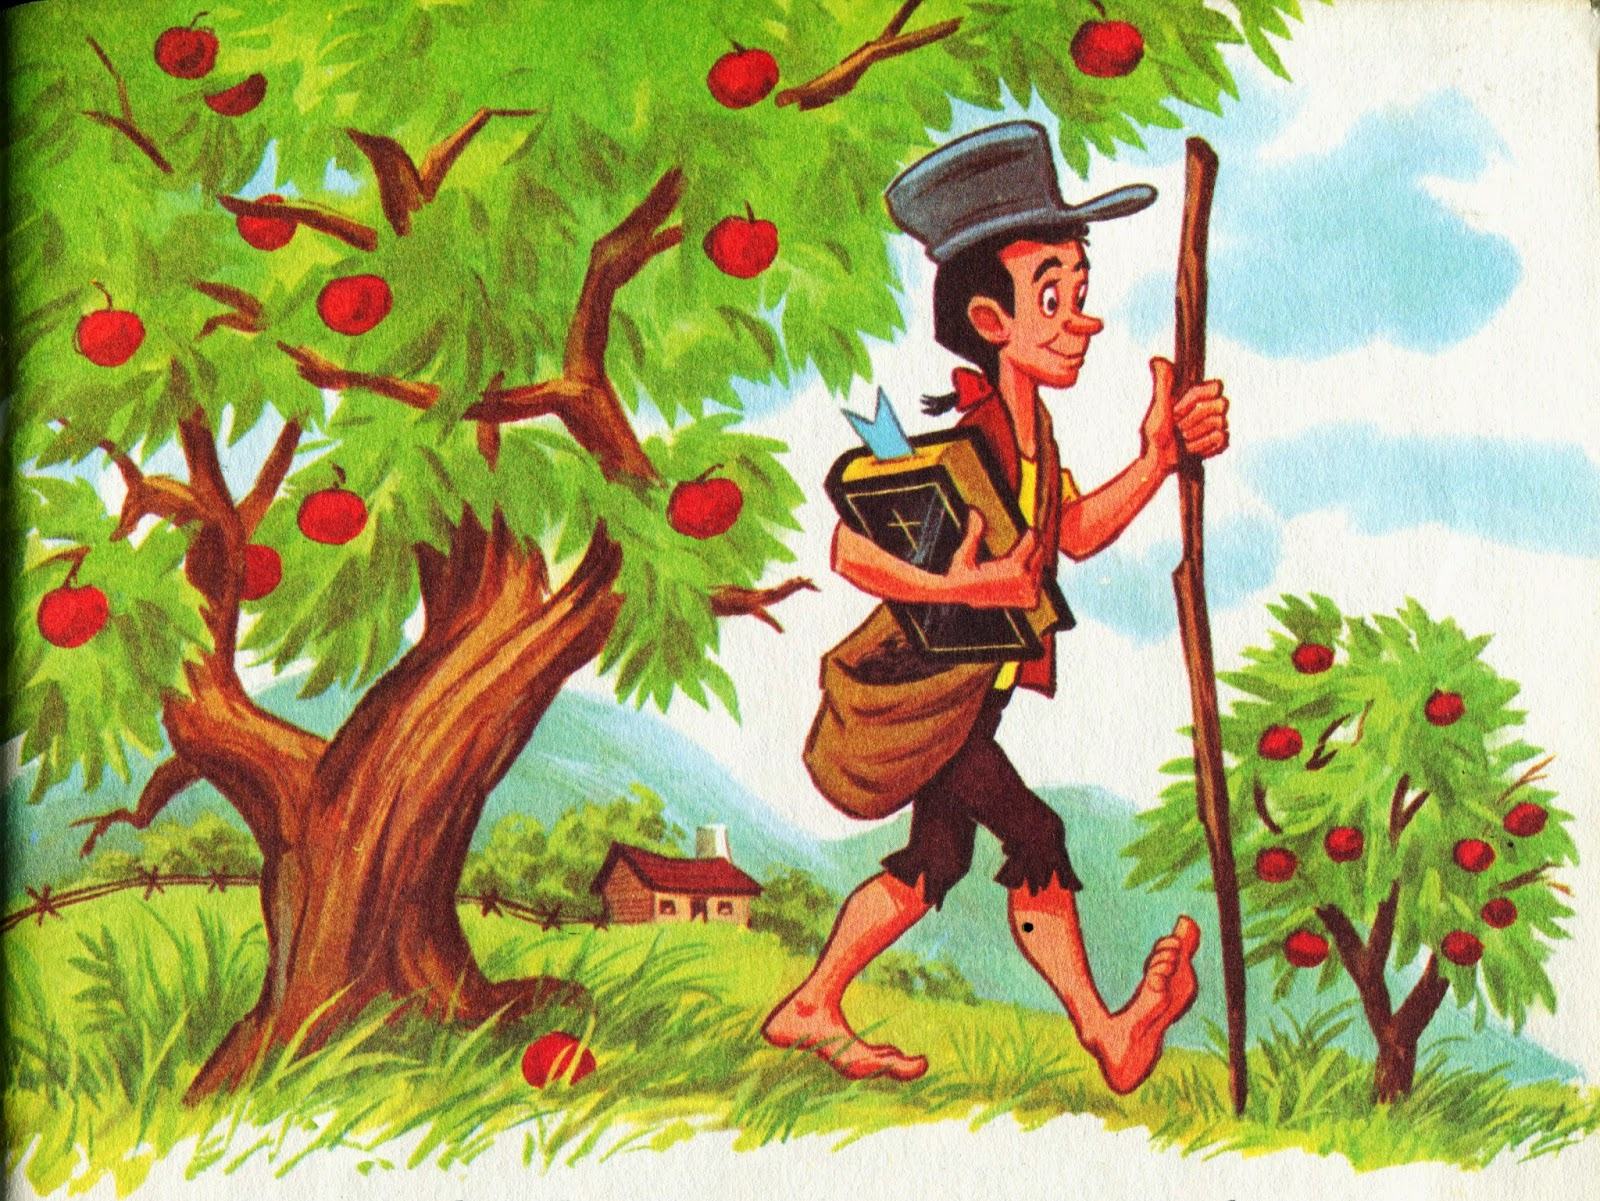 johnny appleseed birthday Happy Birthday Johnny Appleseed! – Family Christian Center Preschool johnny appleseed birthday